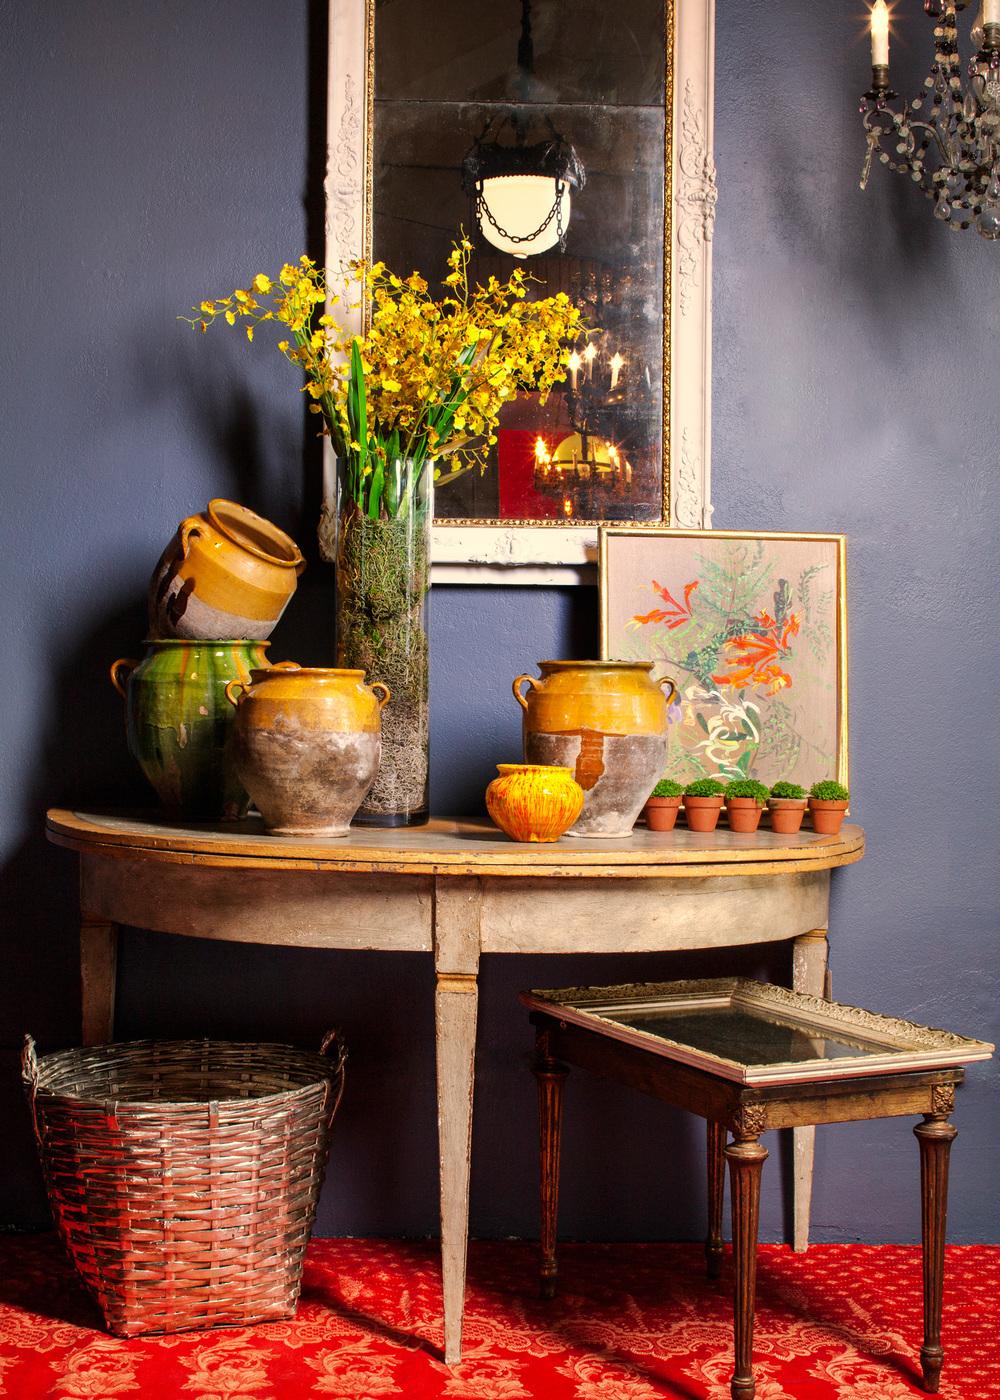 Interiors_41.jpg